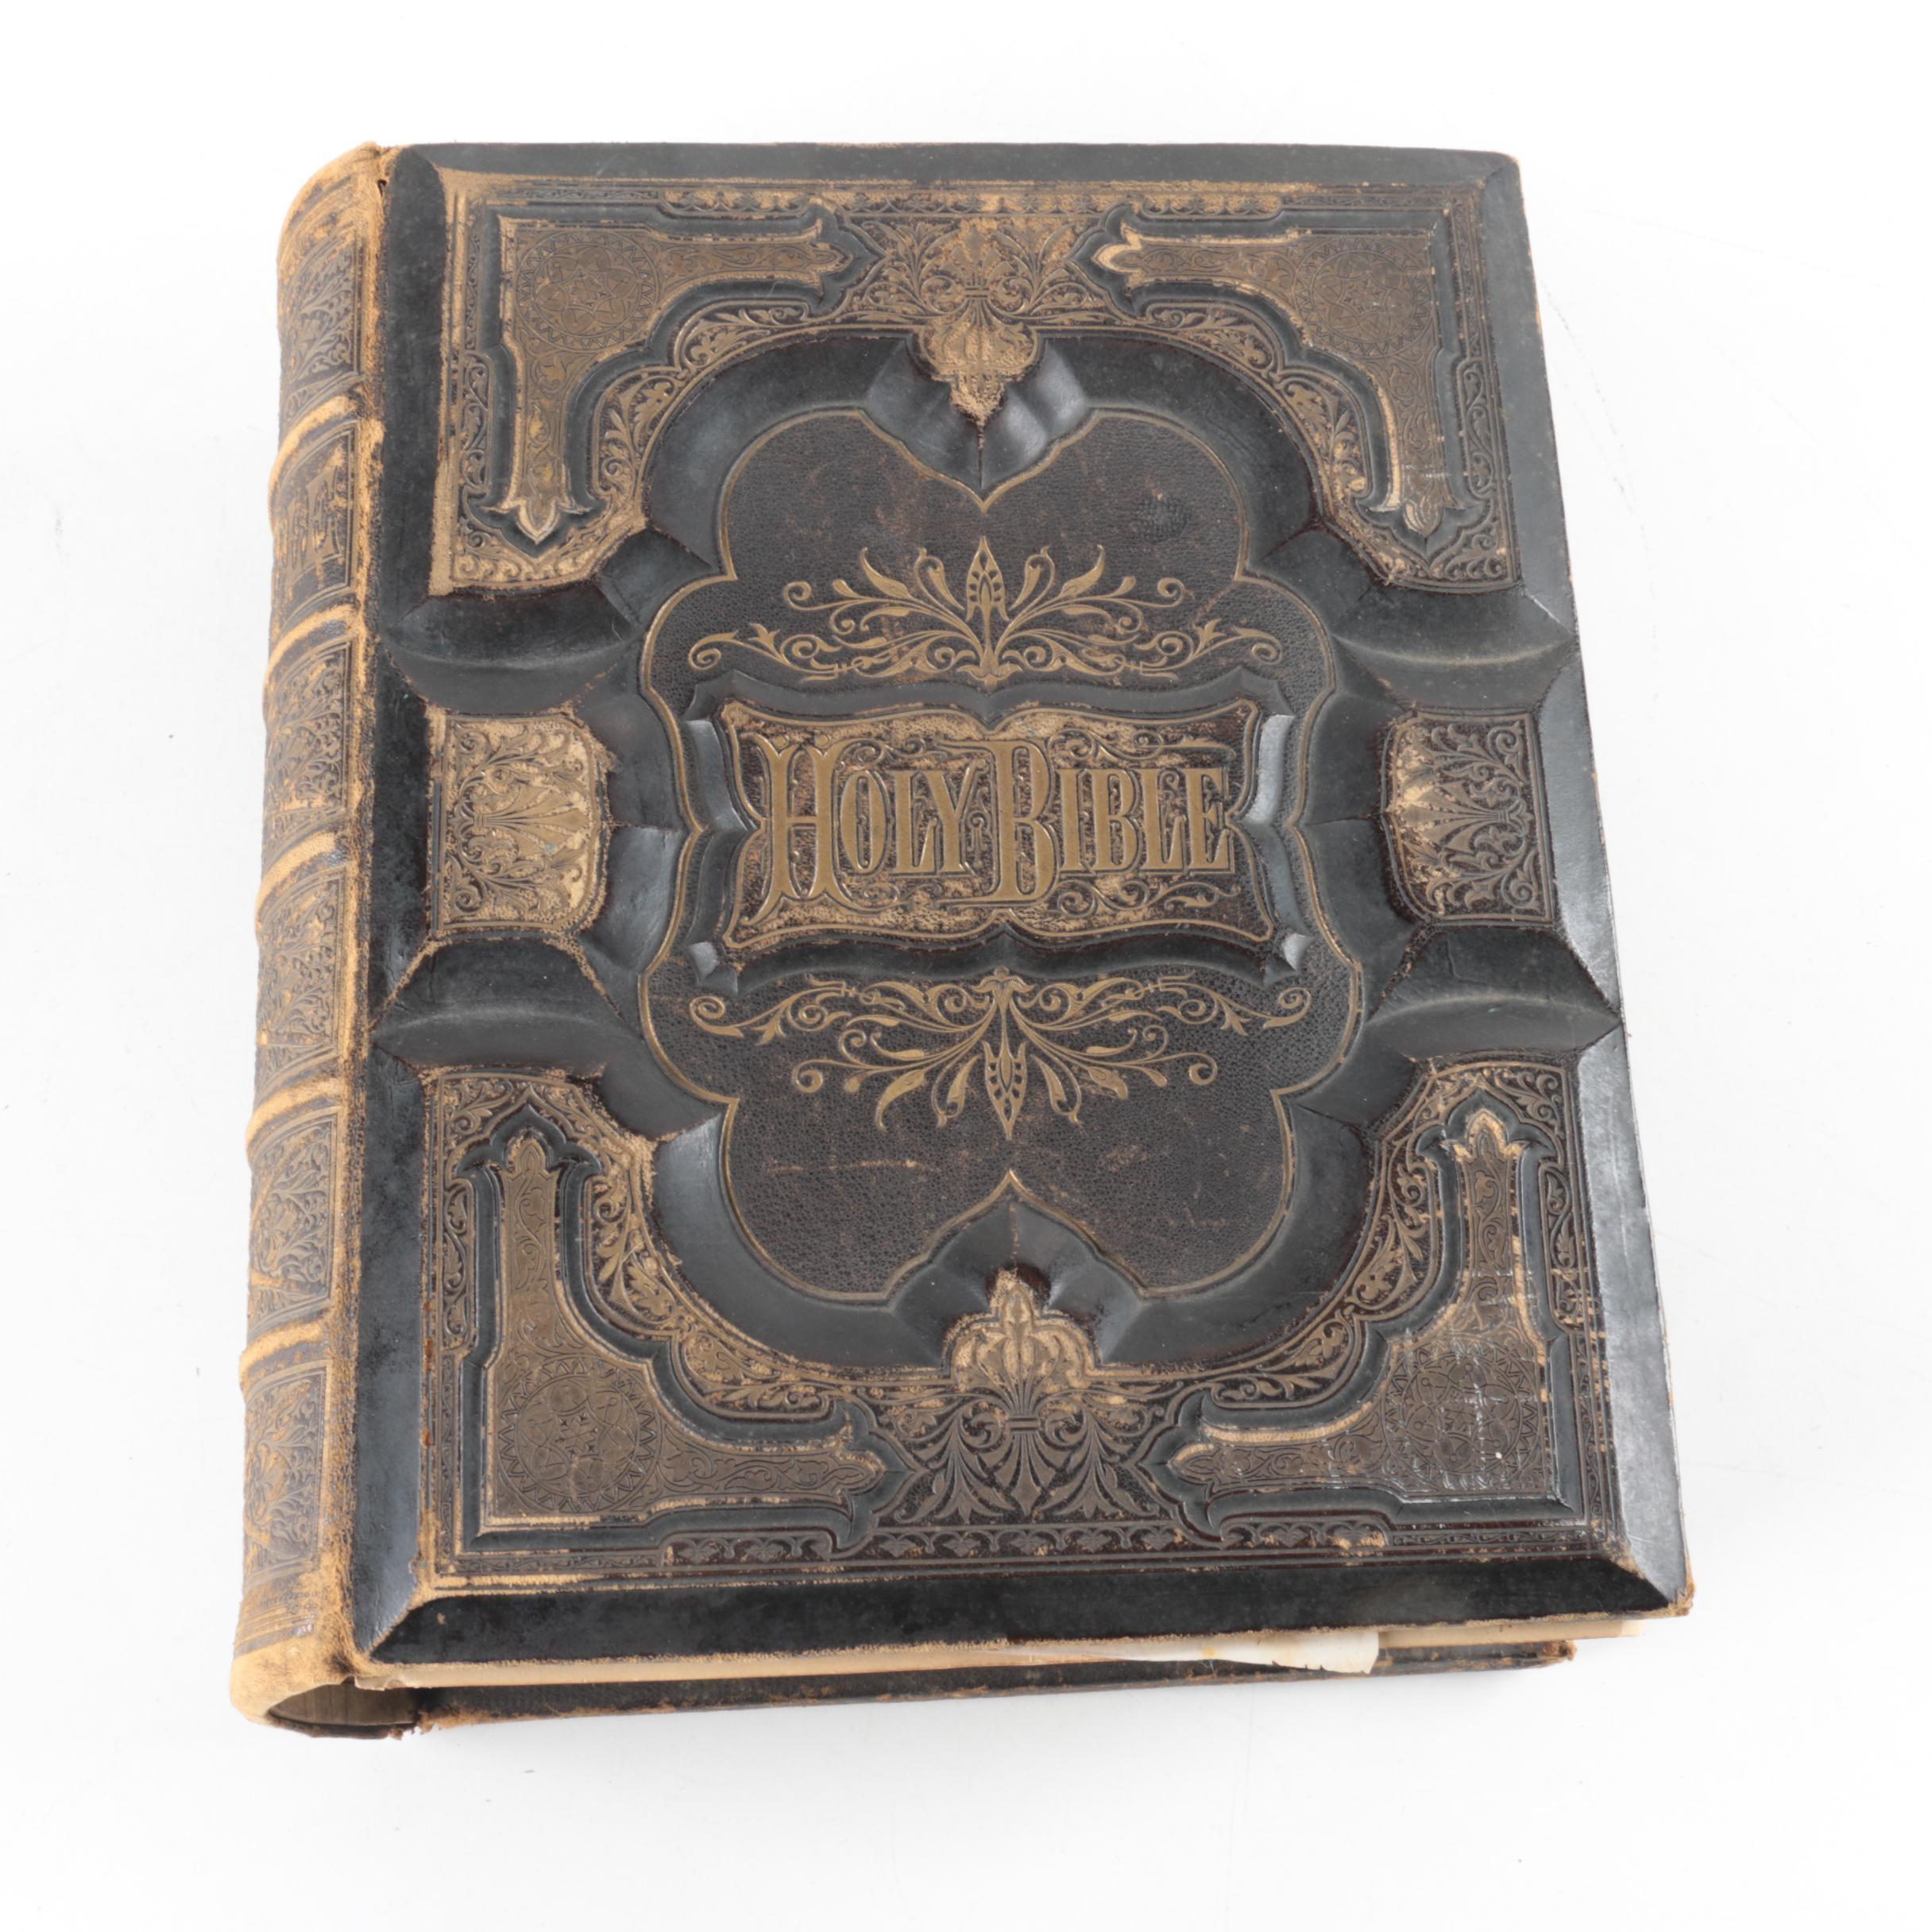 Antique Potter's Family Bible